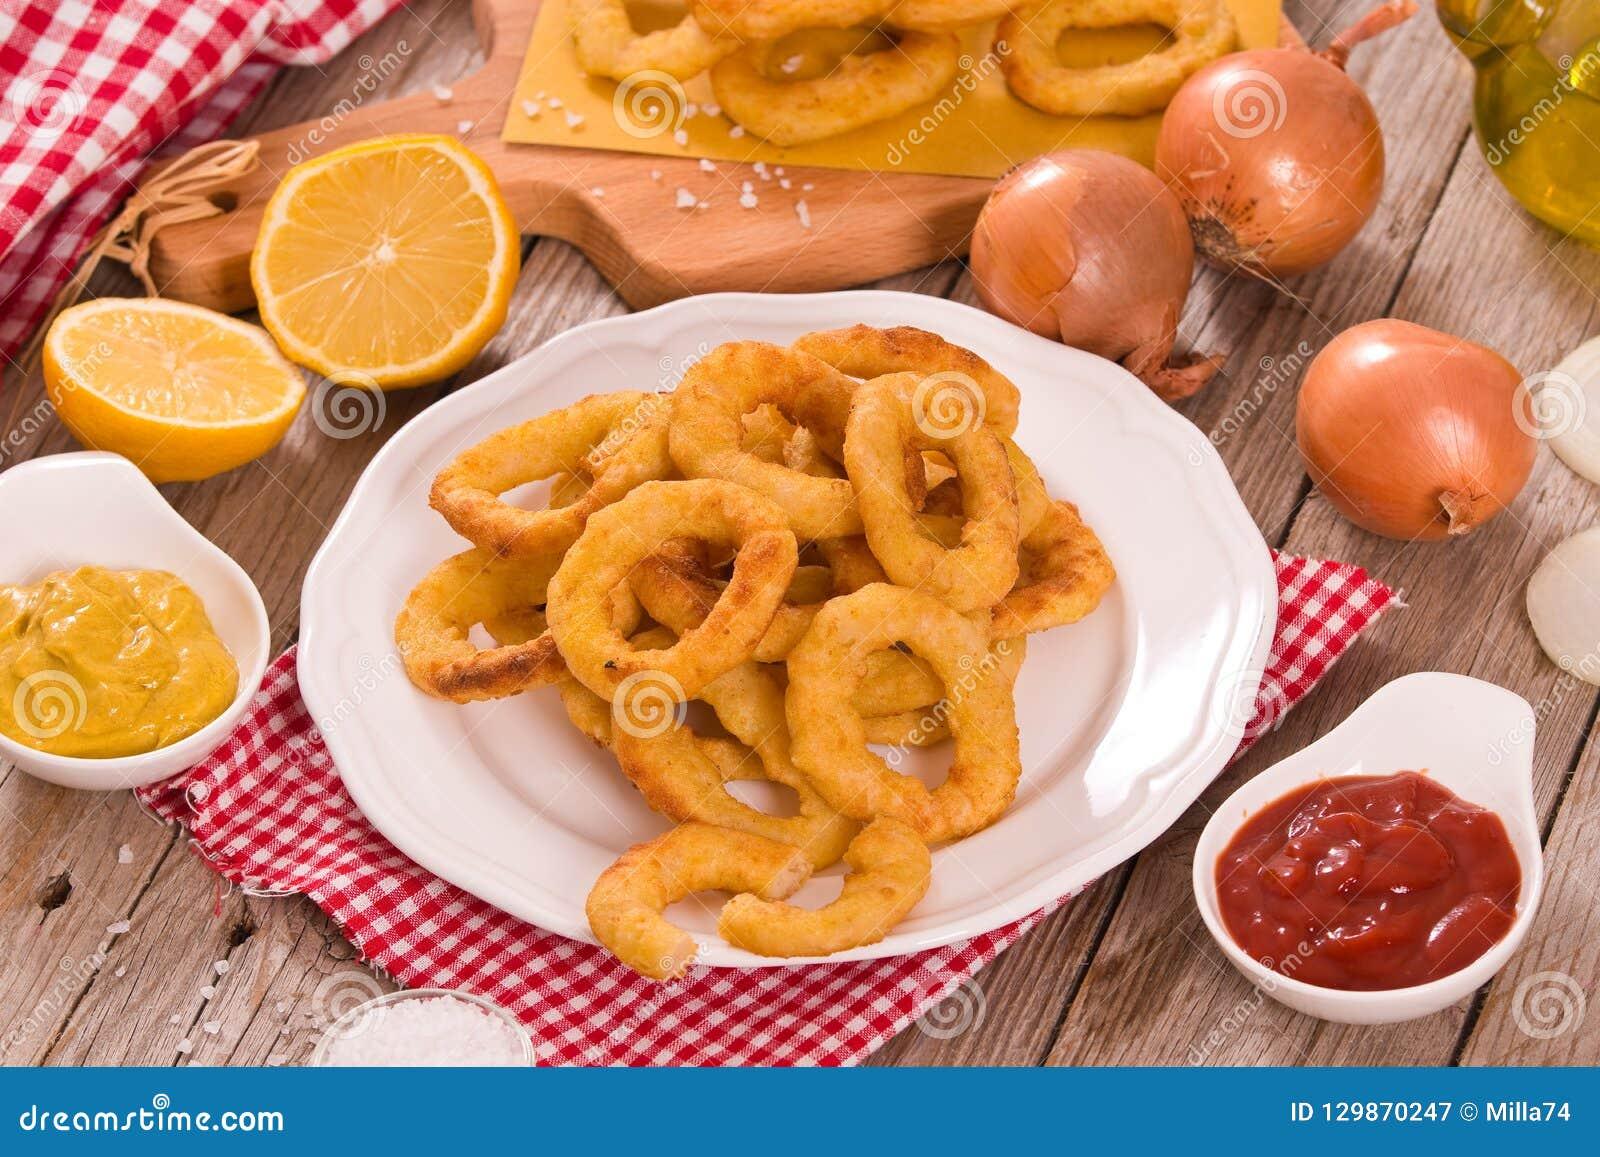 Onion rings.